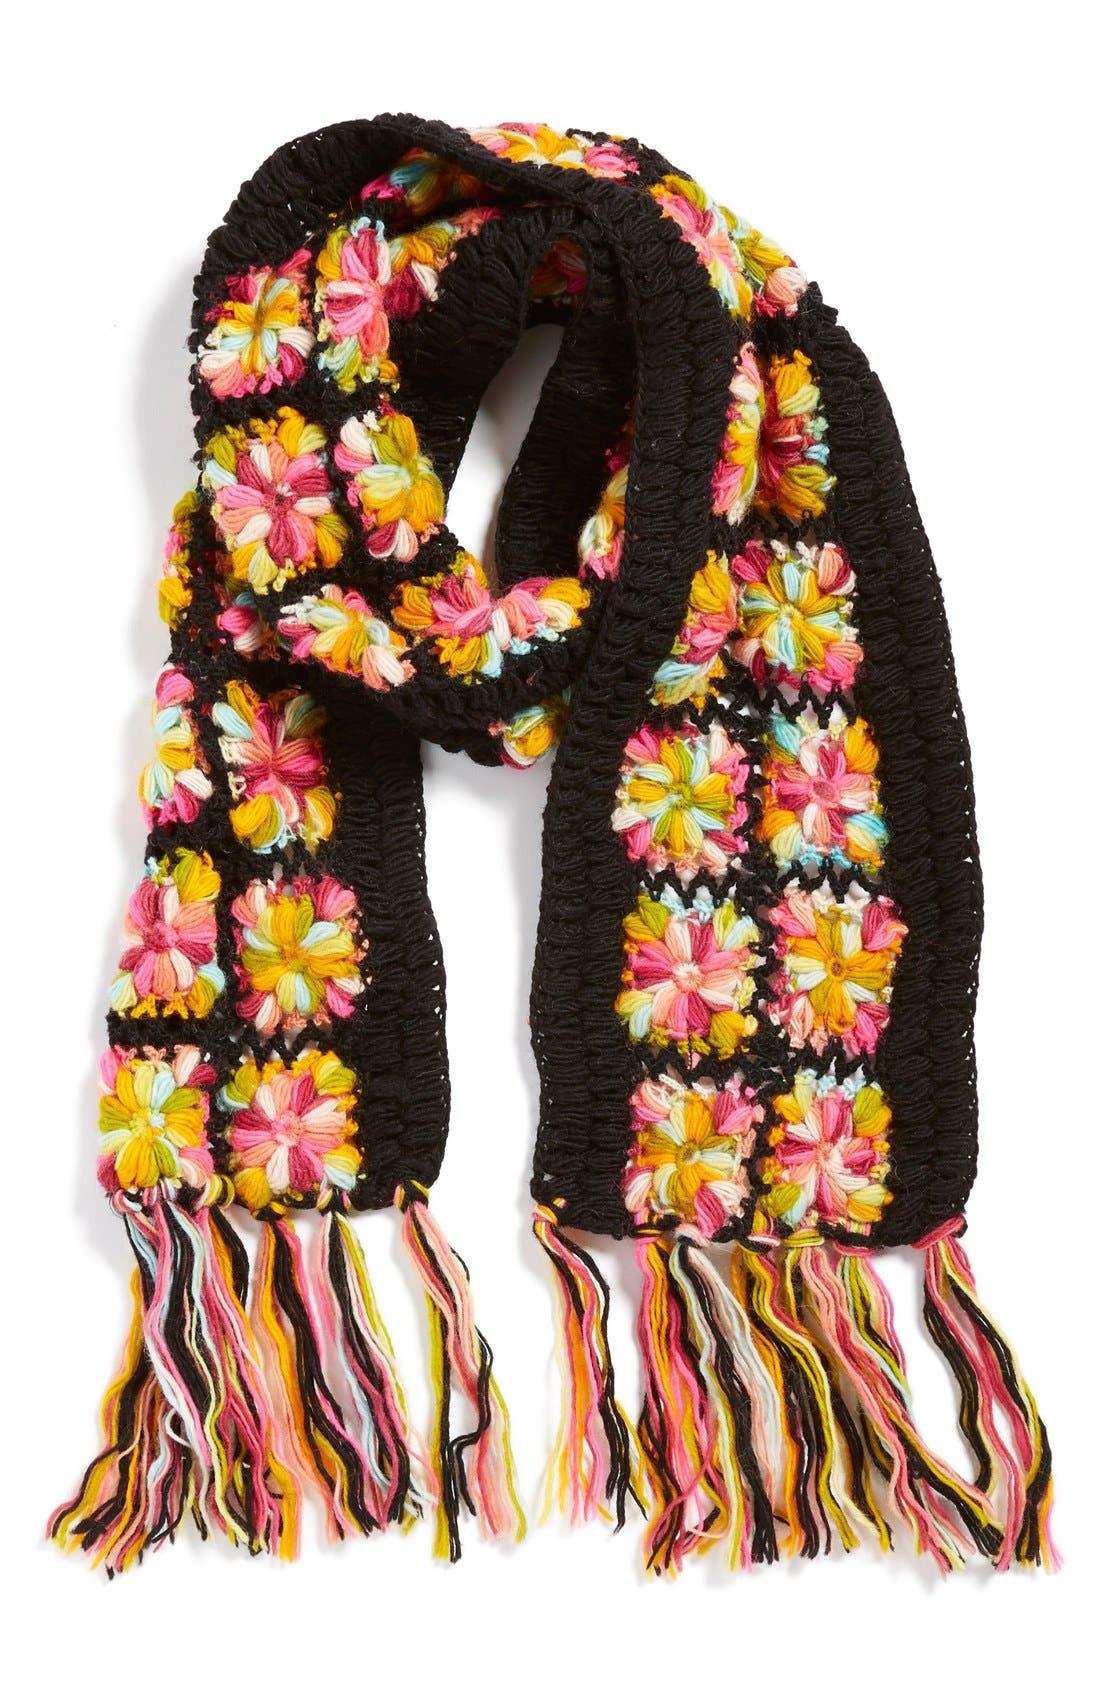 Alternate Image 1 Selected - Nirvanna Designs Crochet Flower Scarf